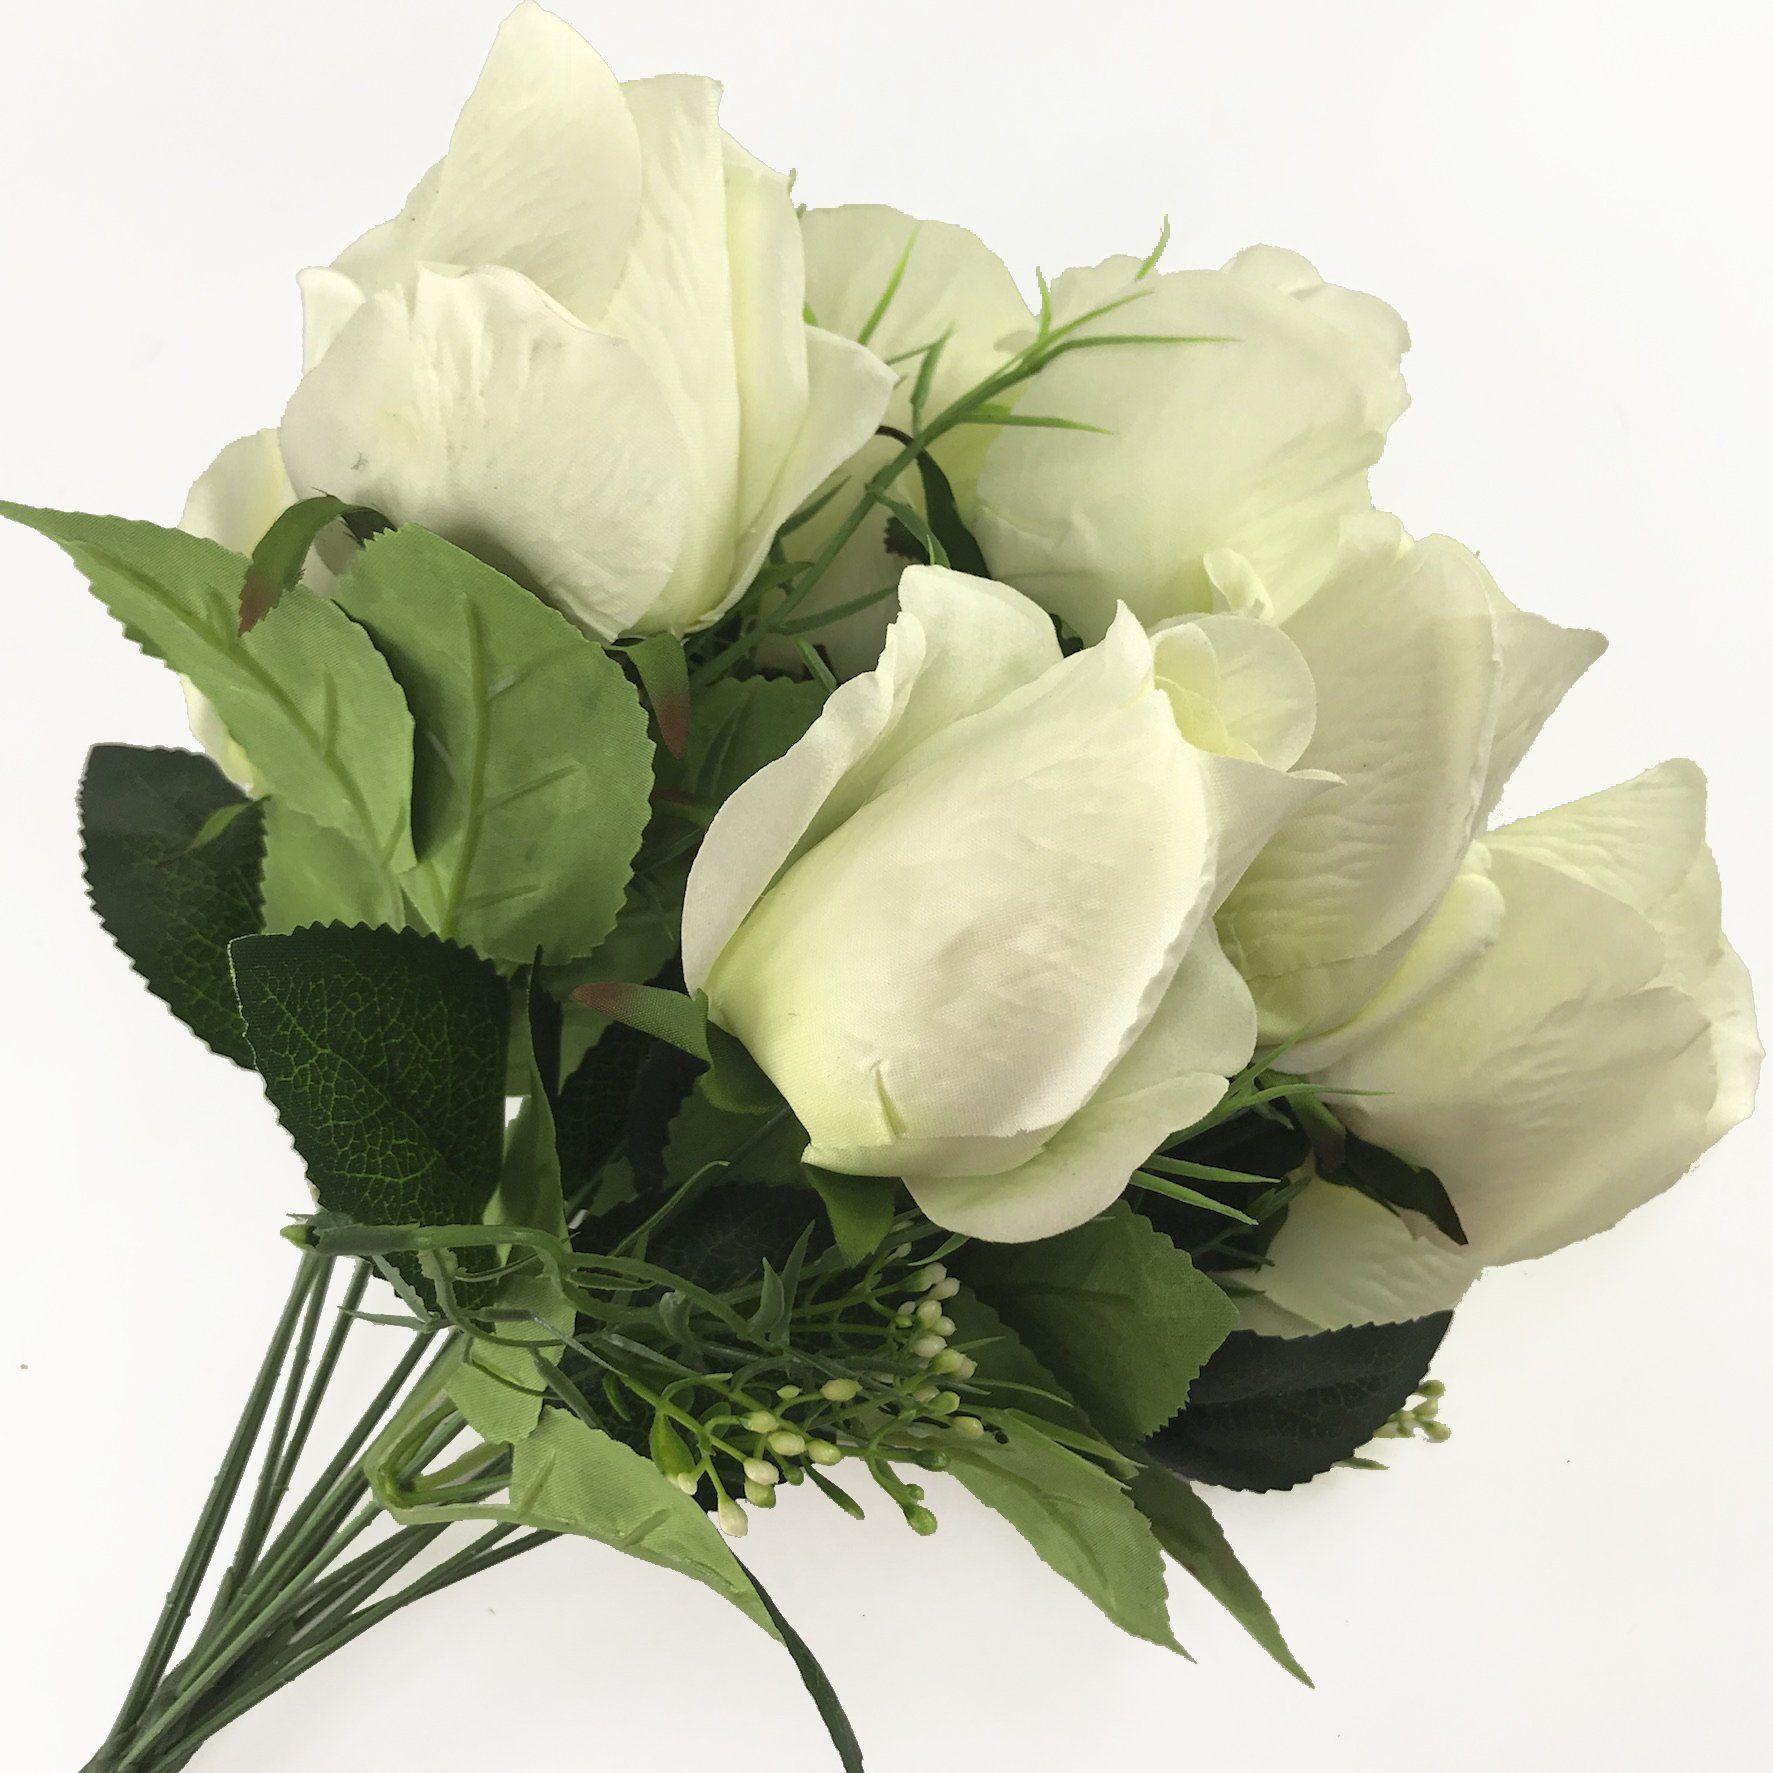 dalamoda artificial flowers 2 bundles 14 heads rose bud flower